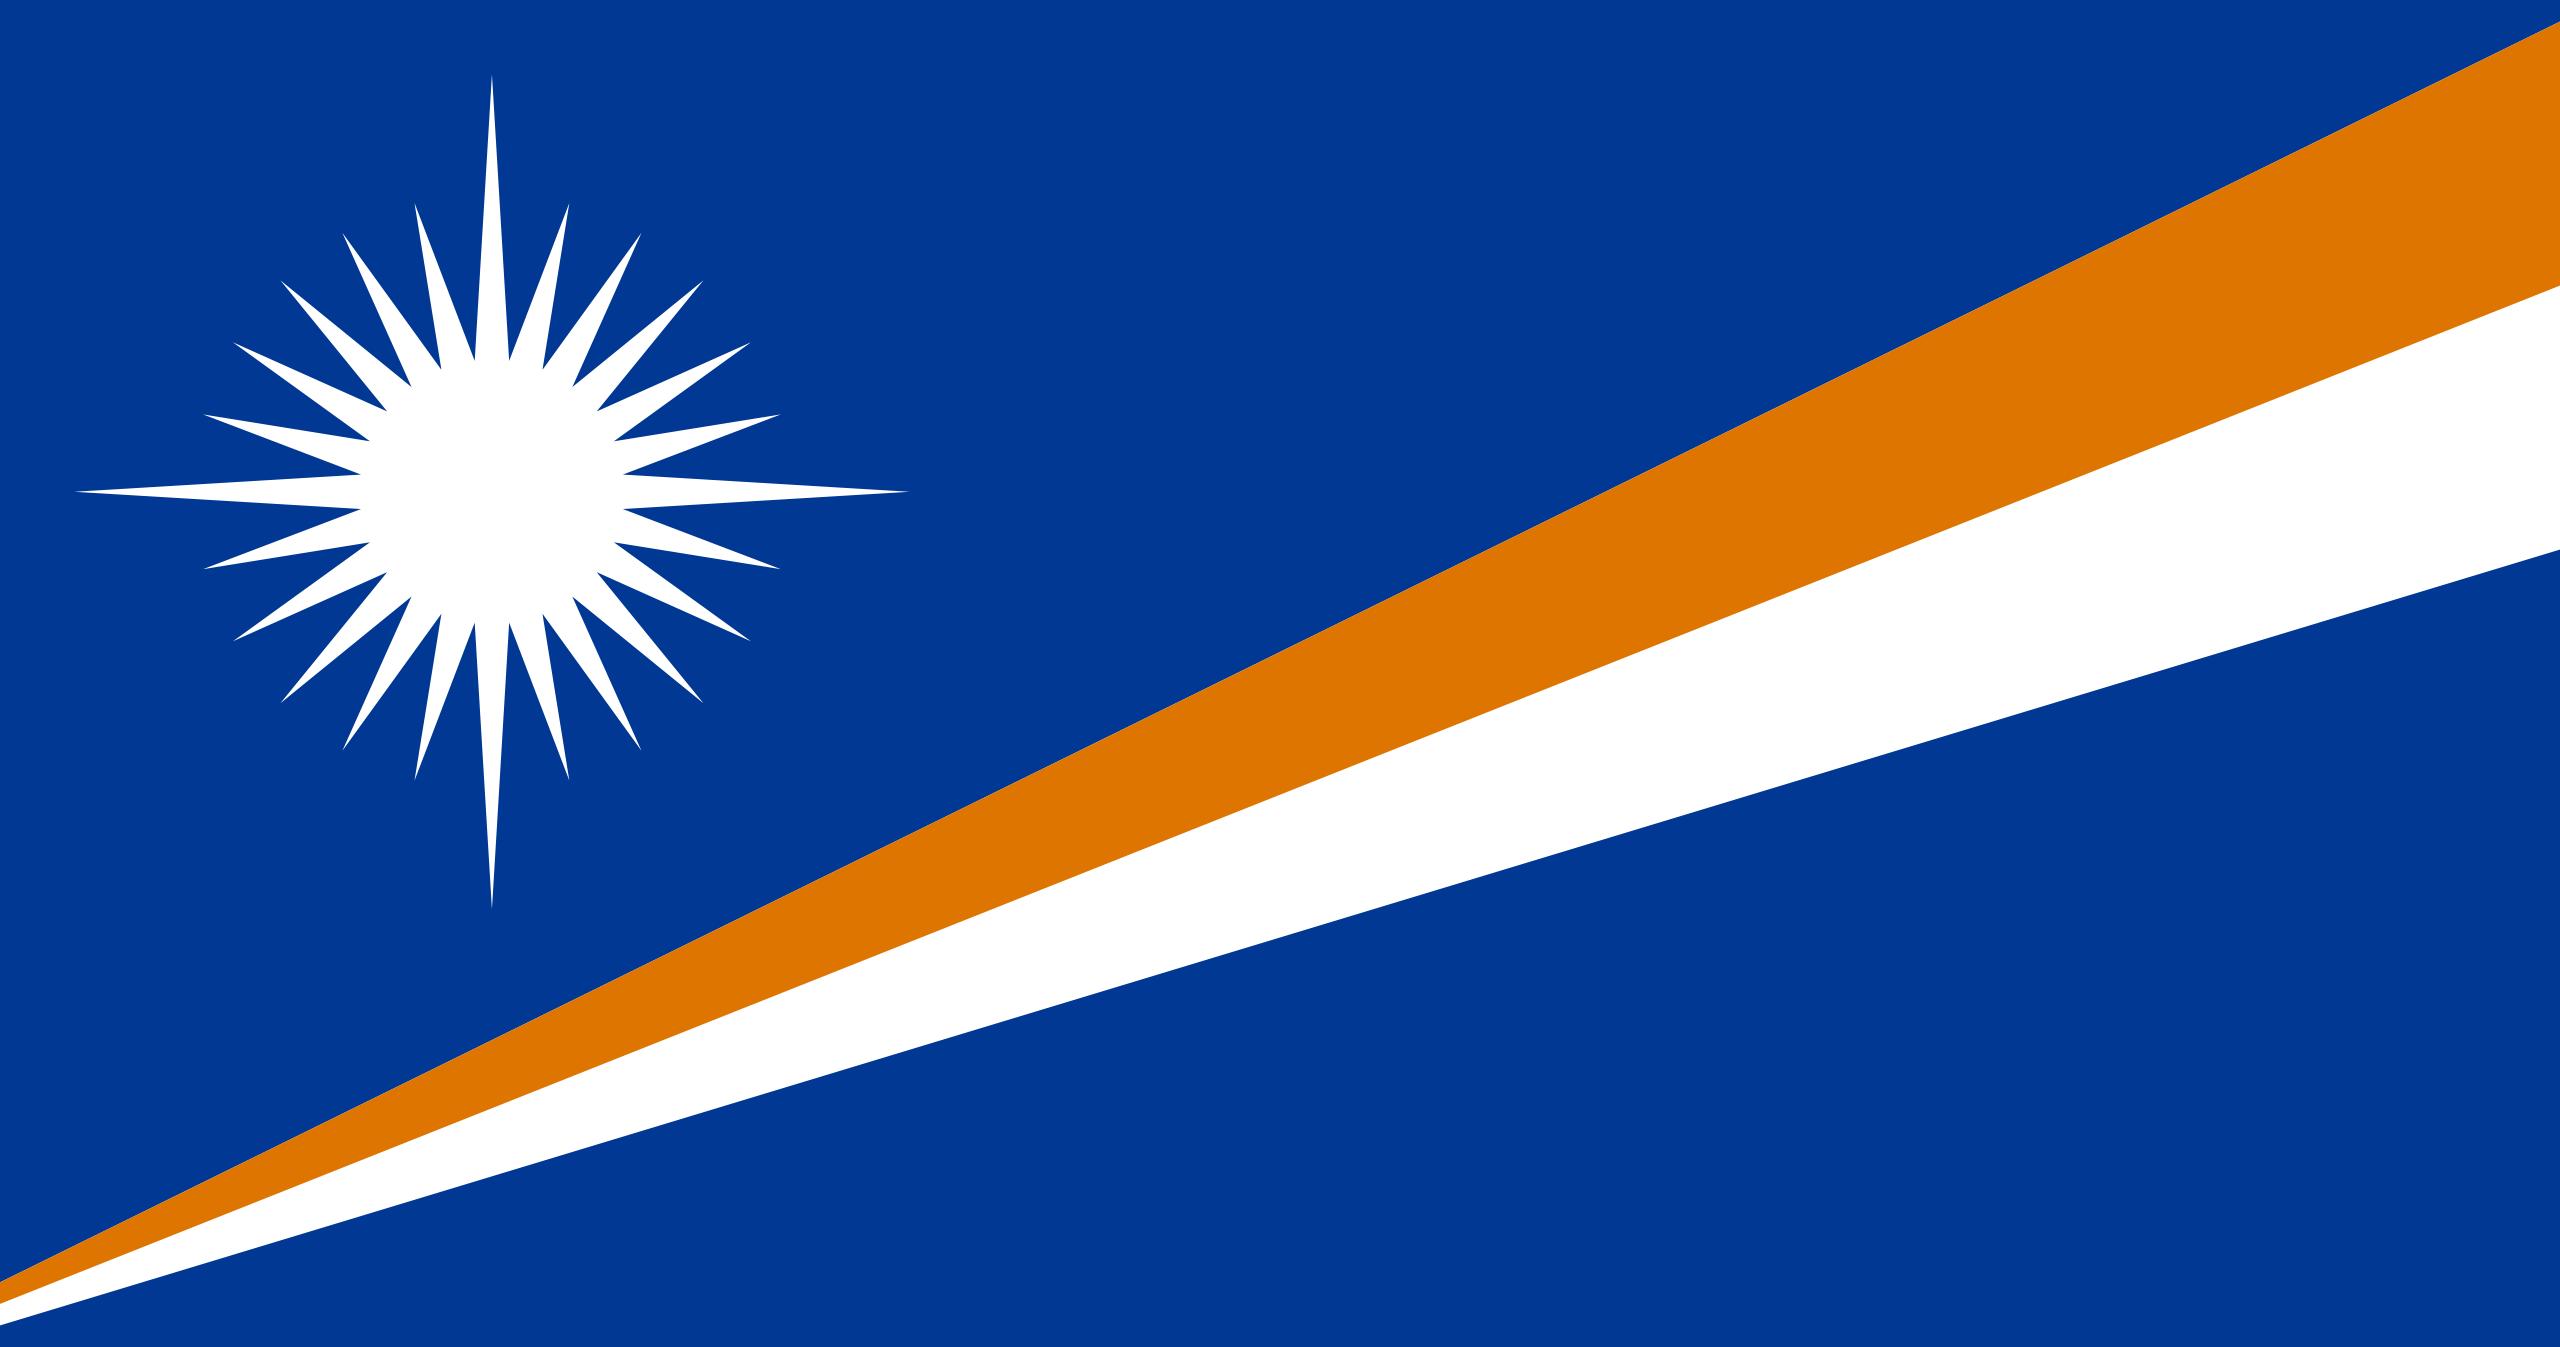 islas marshall, χώρα, έμβλημα, λογότυπο, σύμβολο - Wallpapers HD - Professor-falken.com